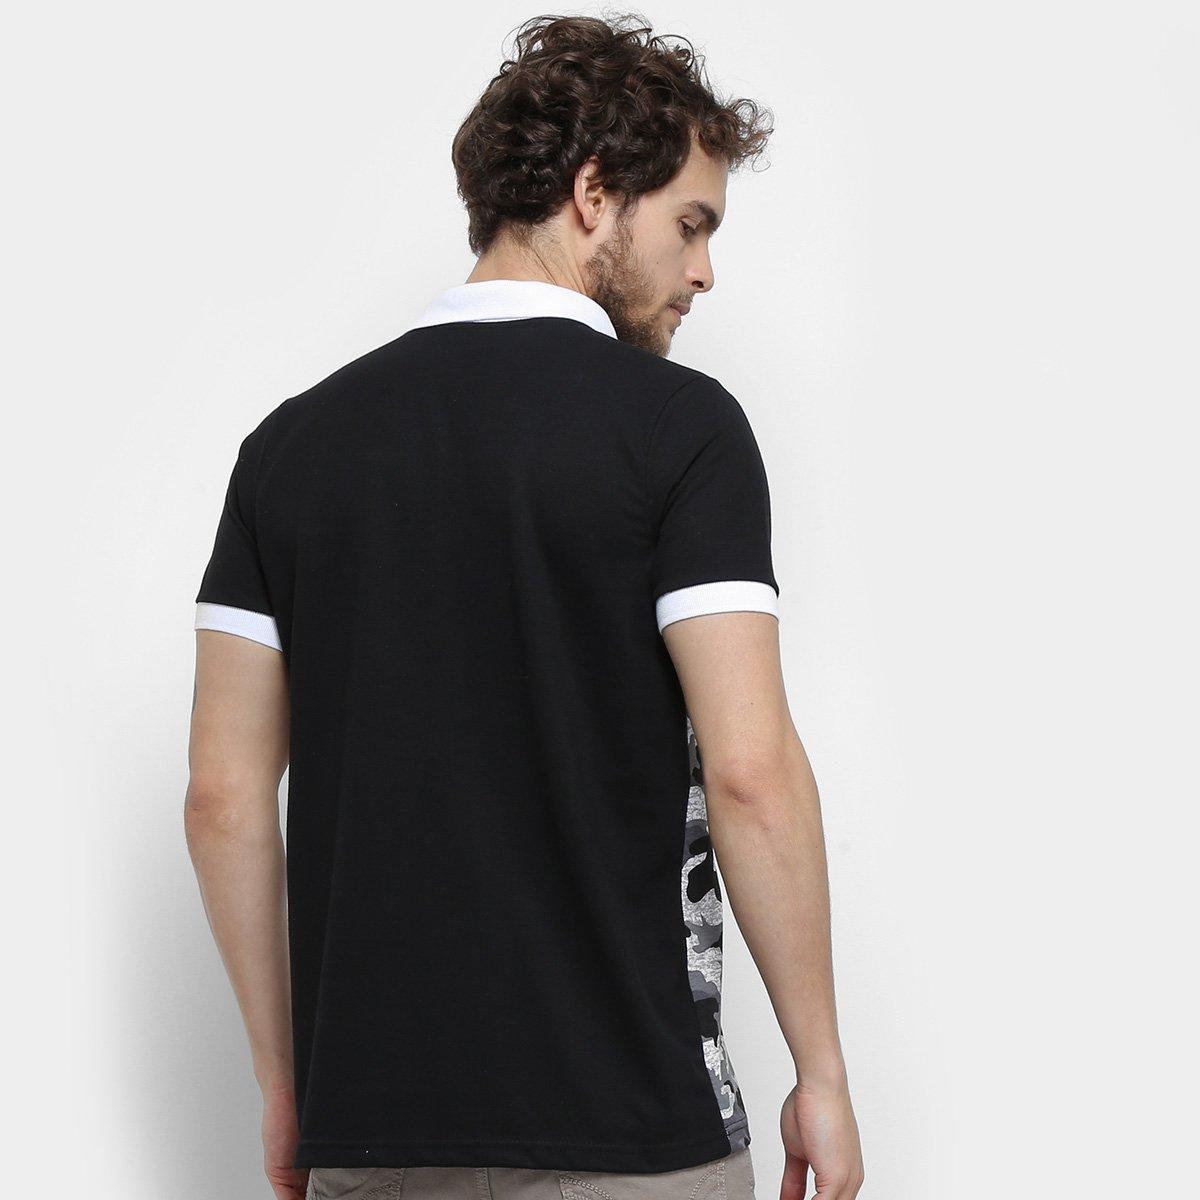 Camisa Polo Jimmy'Z Camuflado Navy Masculina - Cinza e Preto